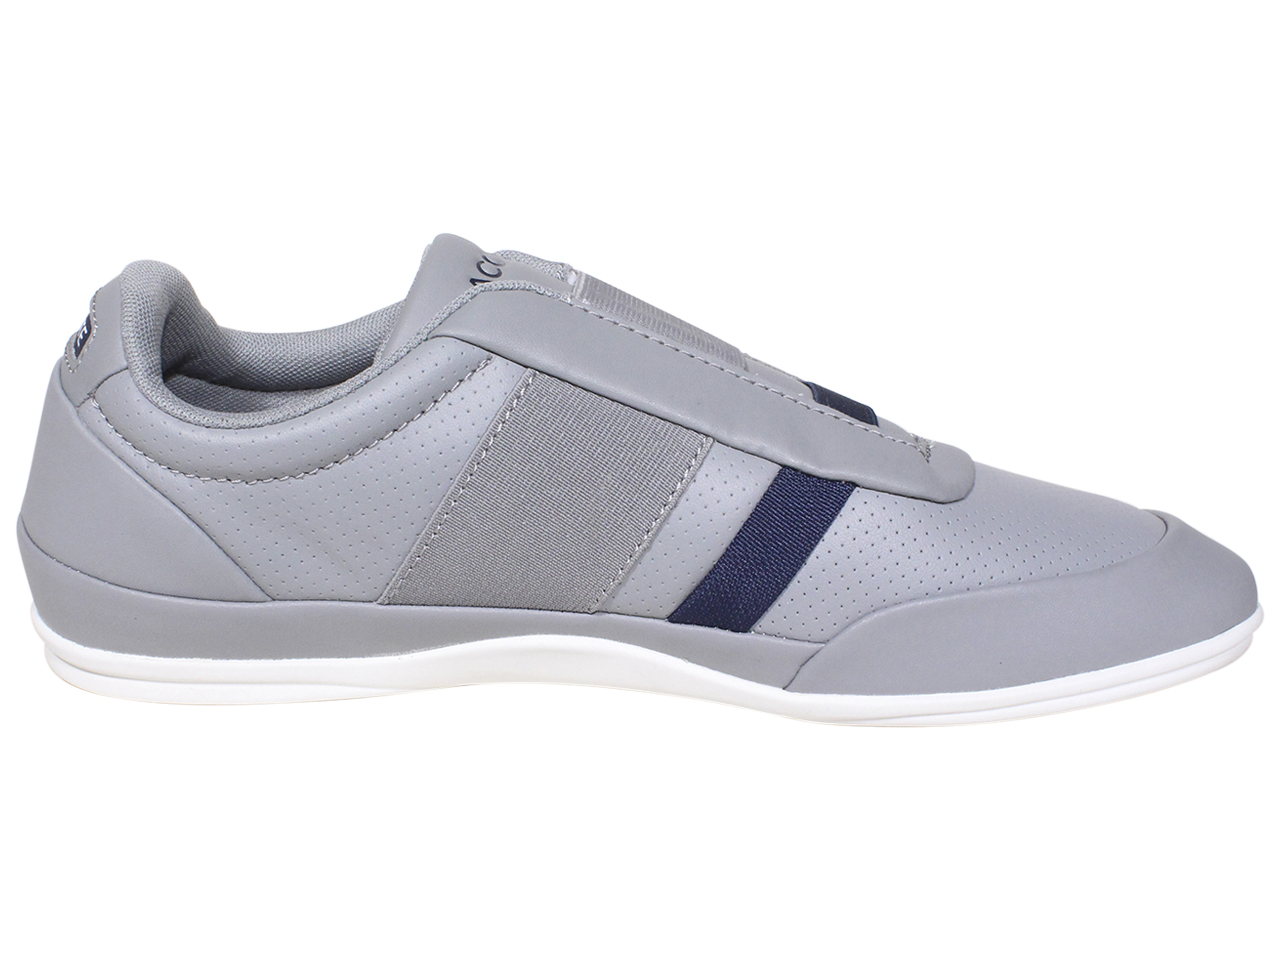 Lacoste-Misano-Elastic-318-Sneakers-Men-039-s-Low-Top-Shoes thumbnail 19